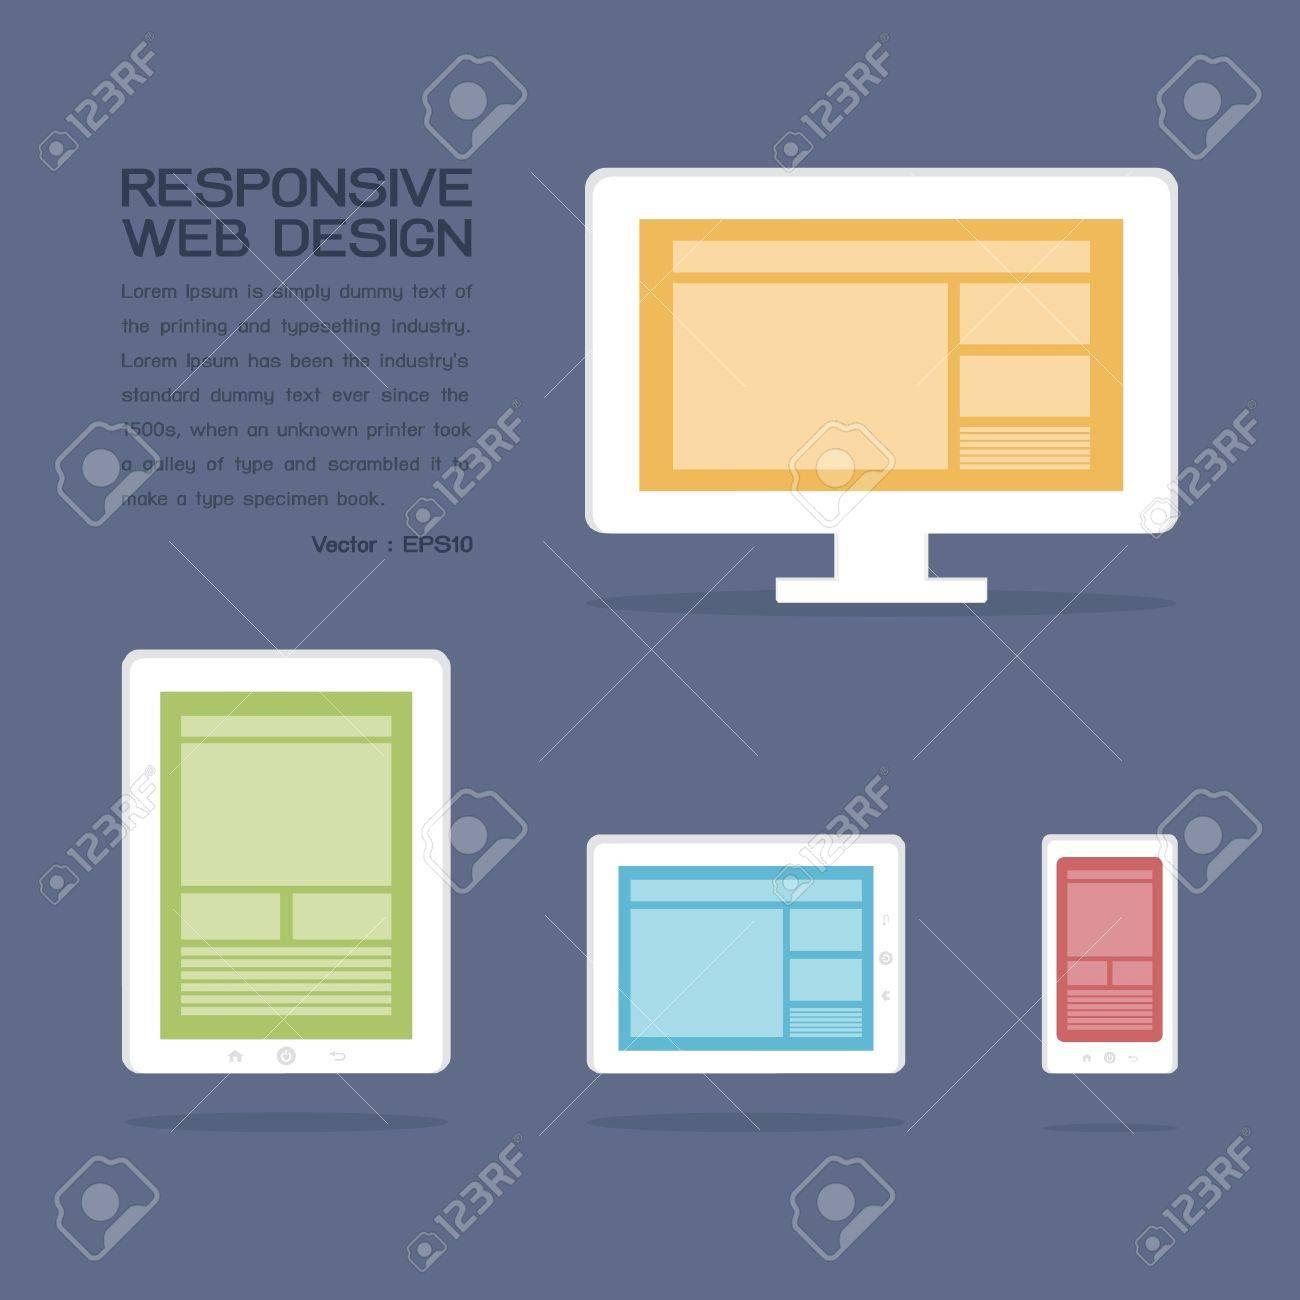 Responsive Web Design, vector Stock Vector - 18429579